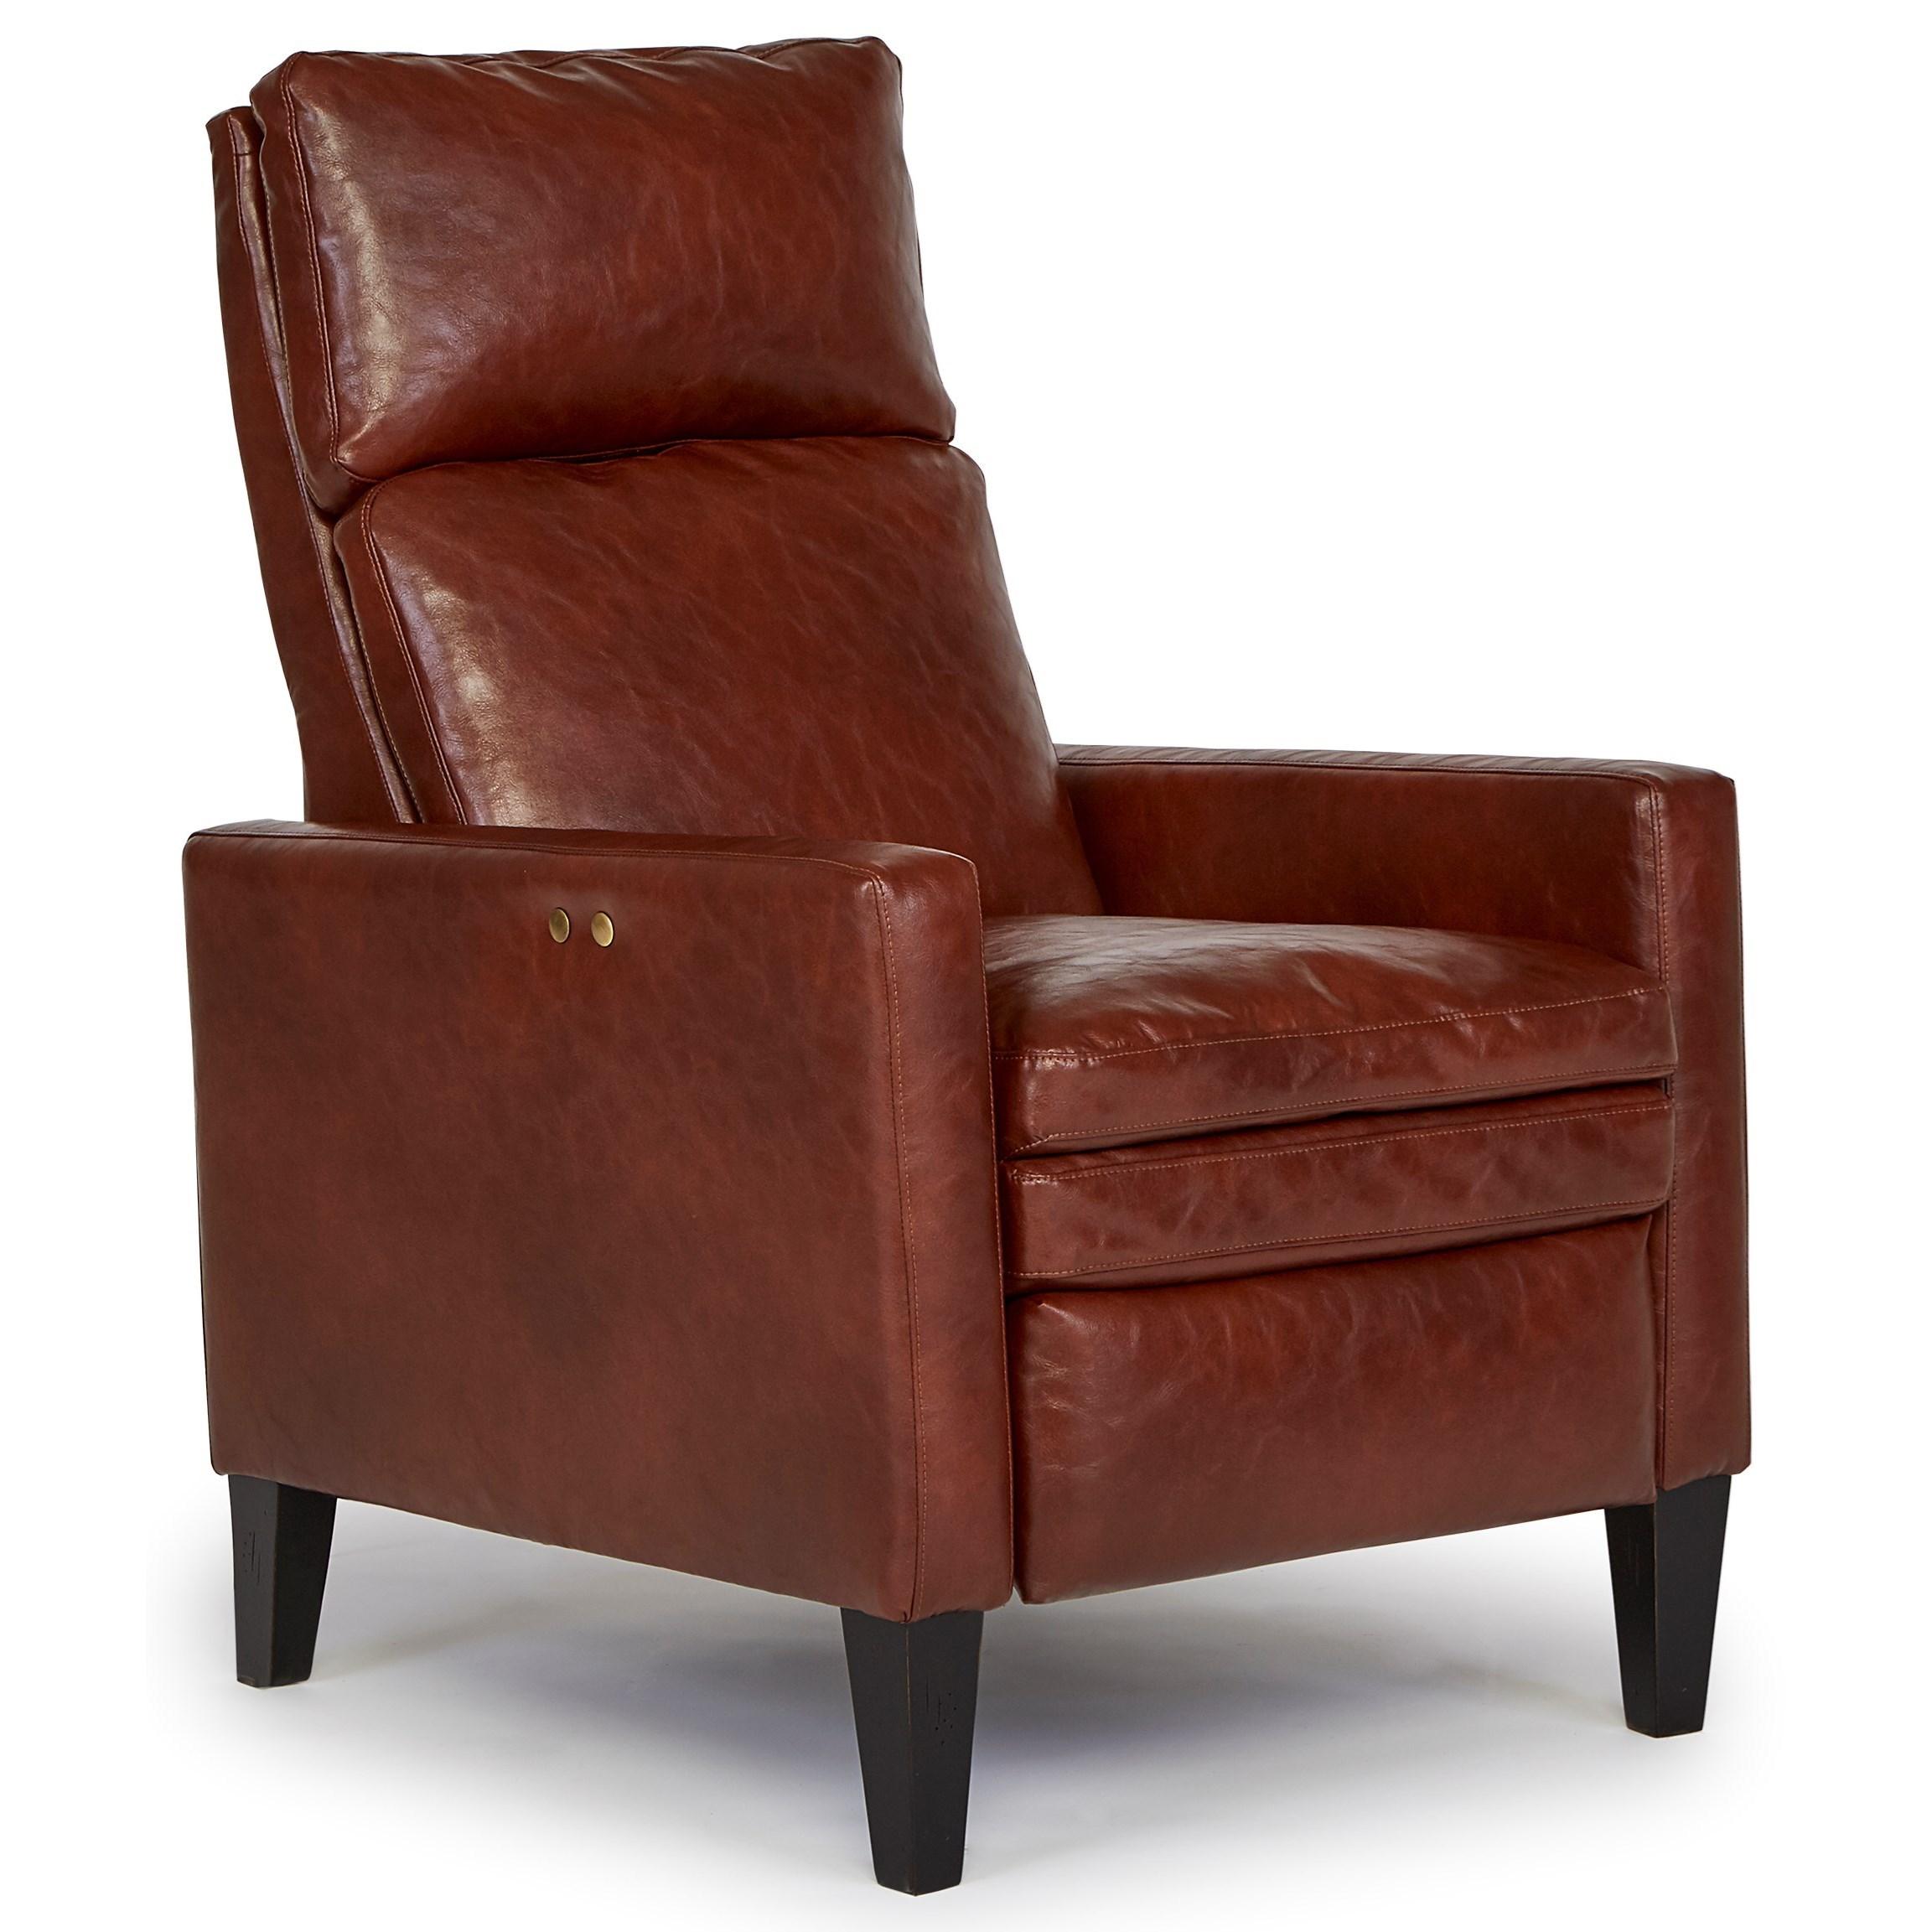 Best Home Furnishings Pushback Recliners Myles High Leg Recliner Wayside Furniture High Leg